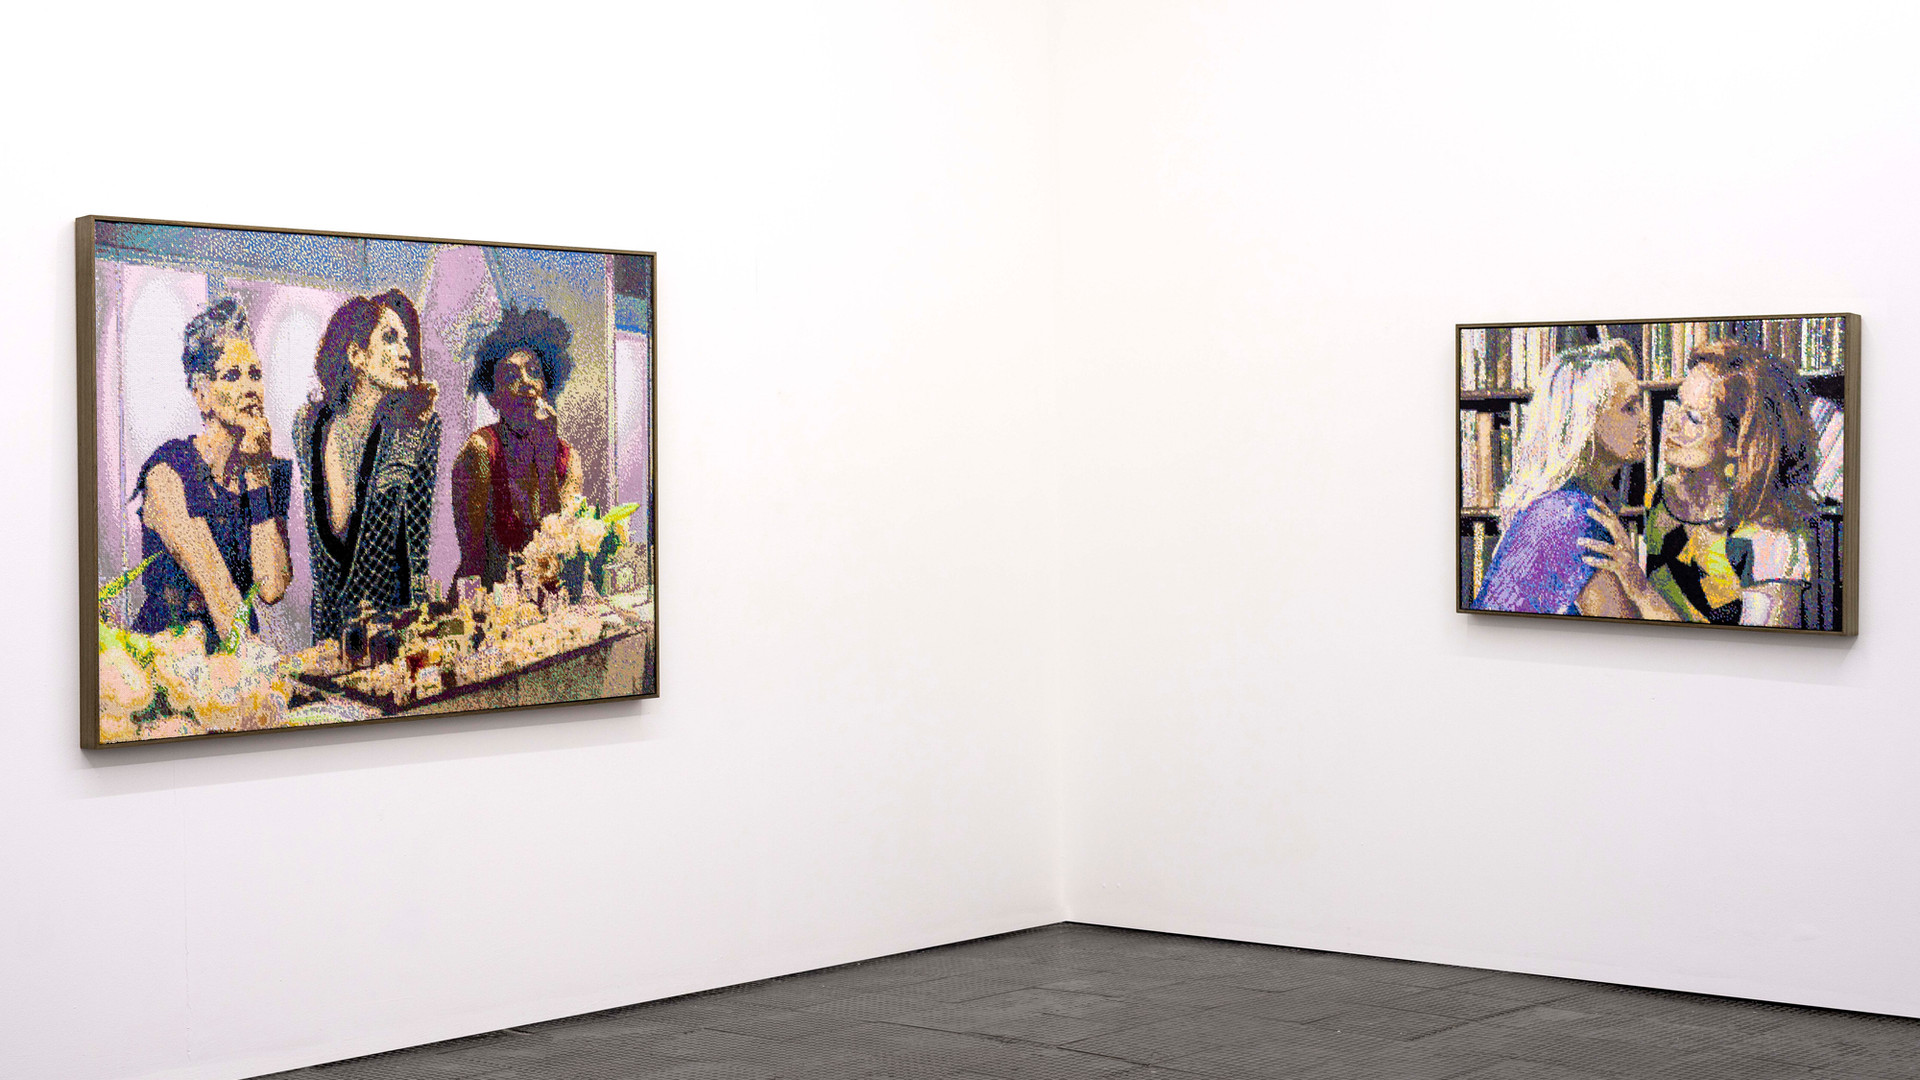 Frances Goodman | Artist Room | 2020 | Installation View